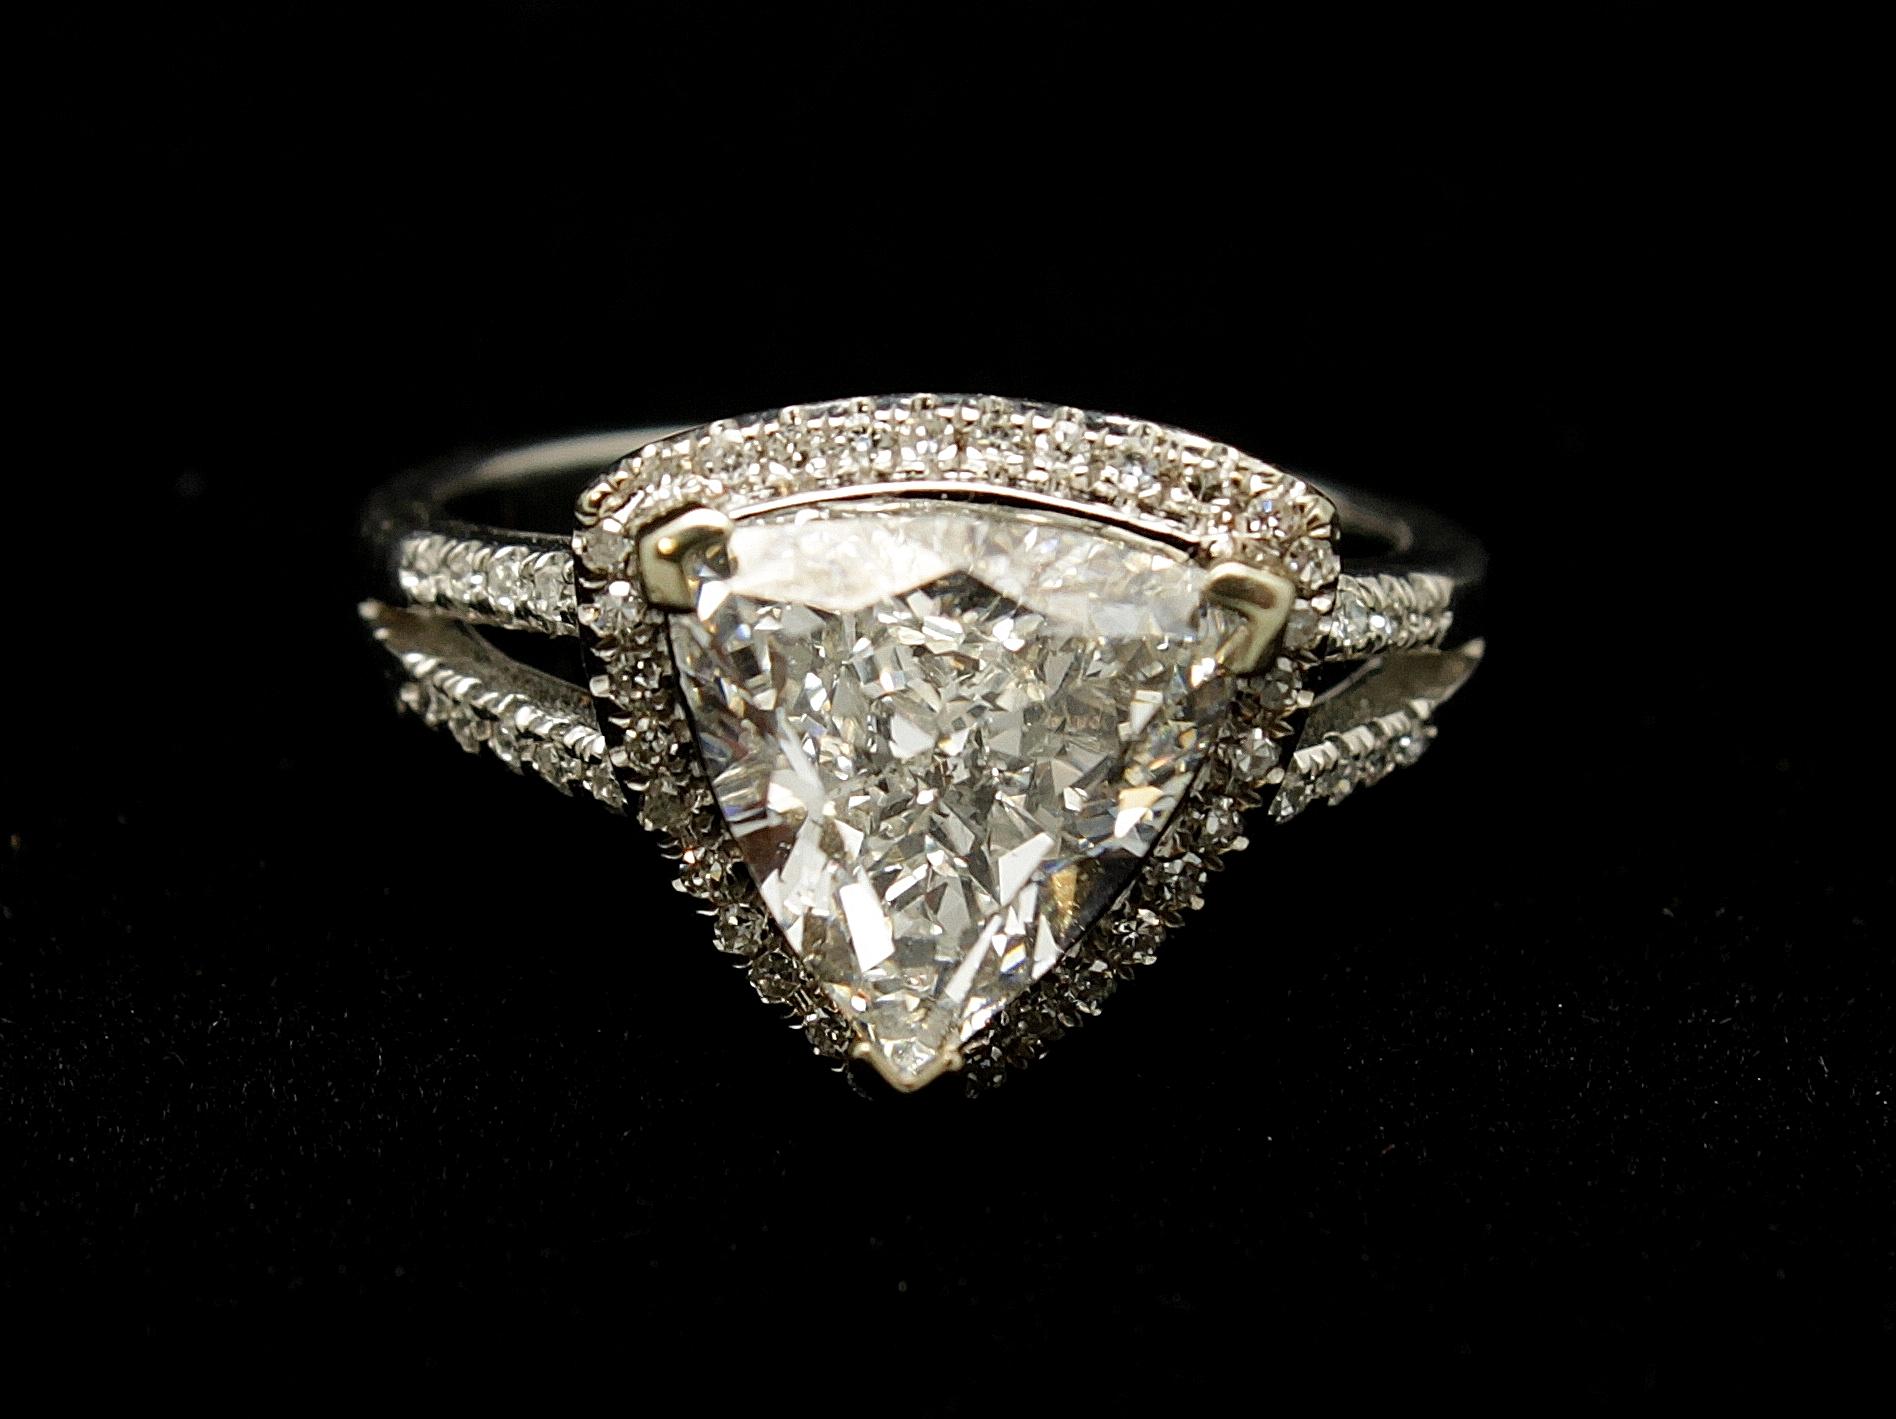 Vintage 14kt Diamond Ring 2.5cts